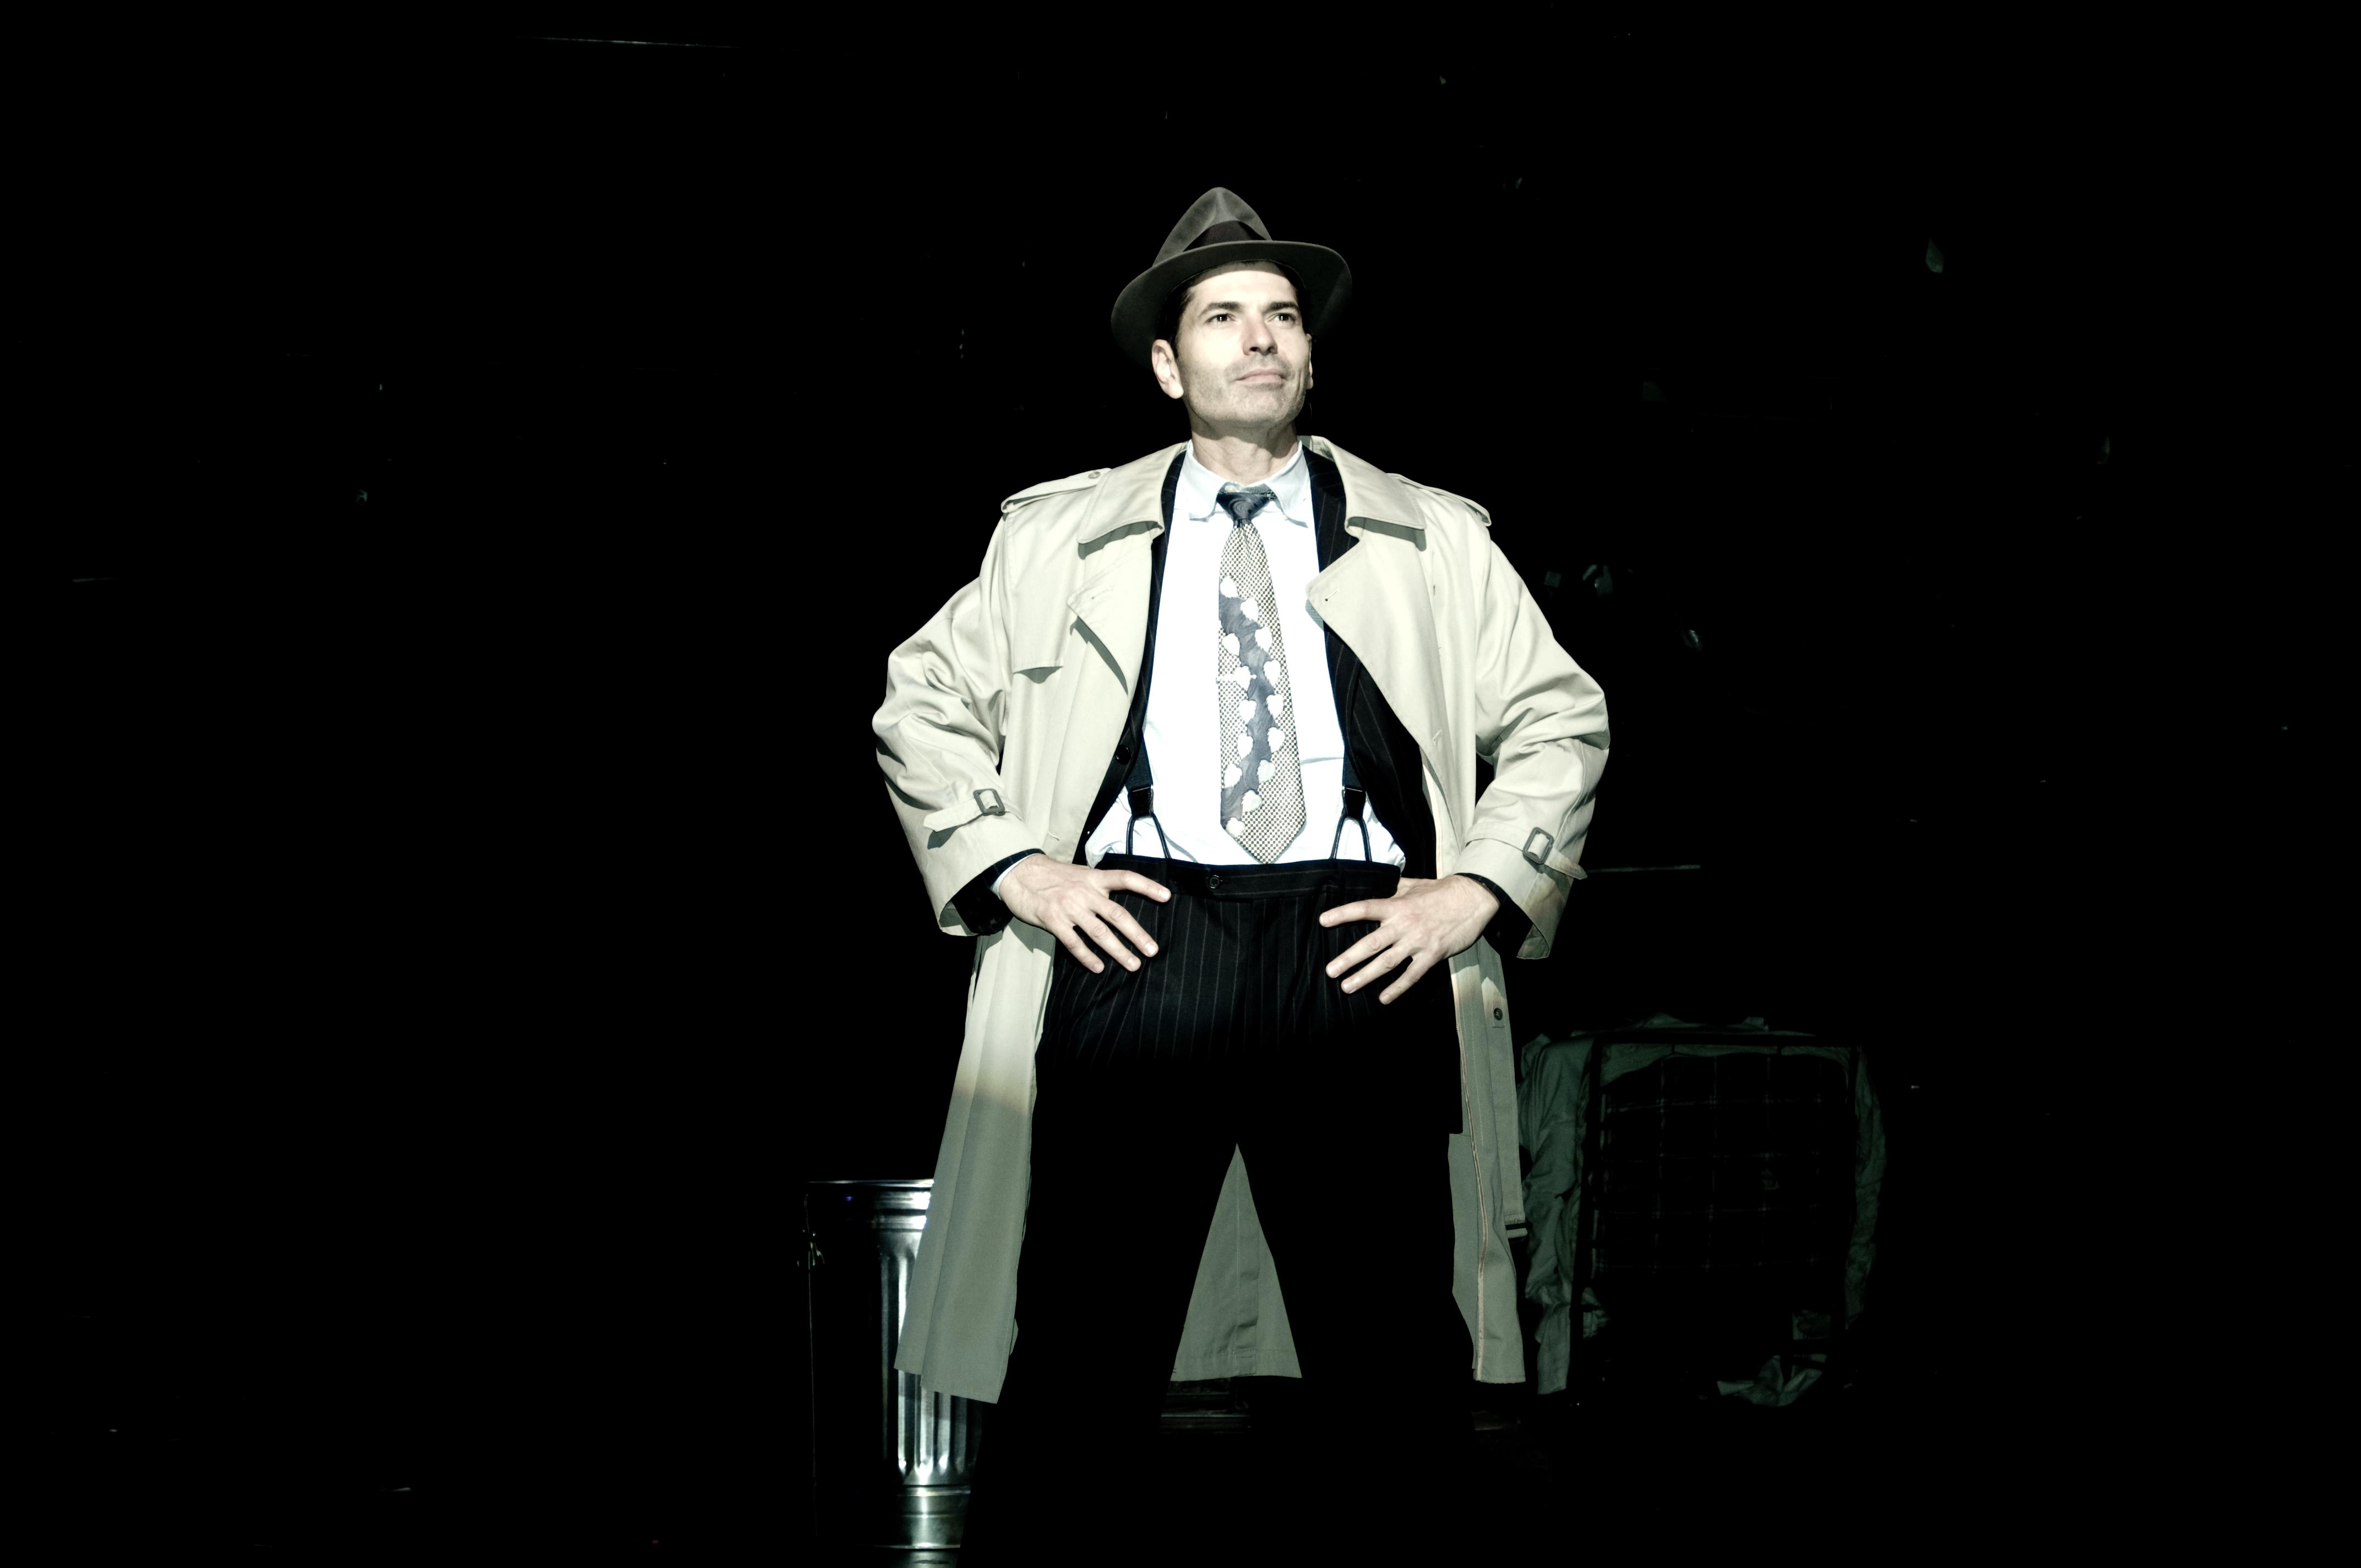 Joe Barbara as Scoop O'Reilly